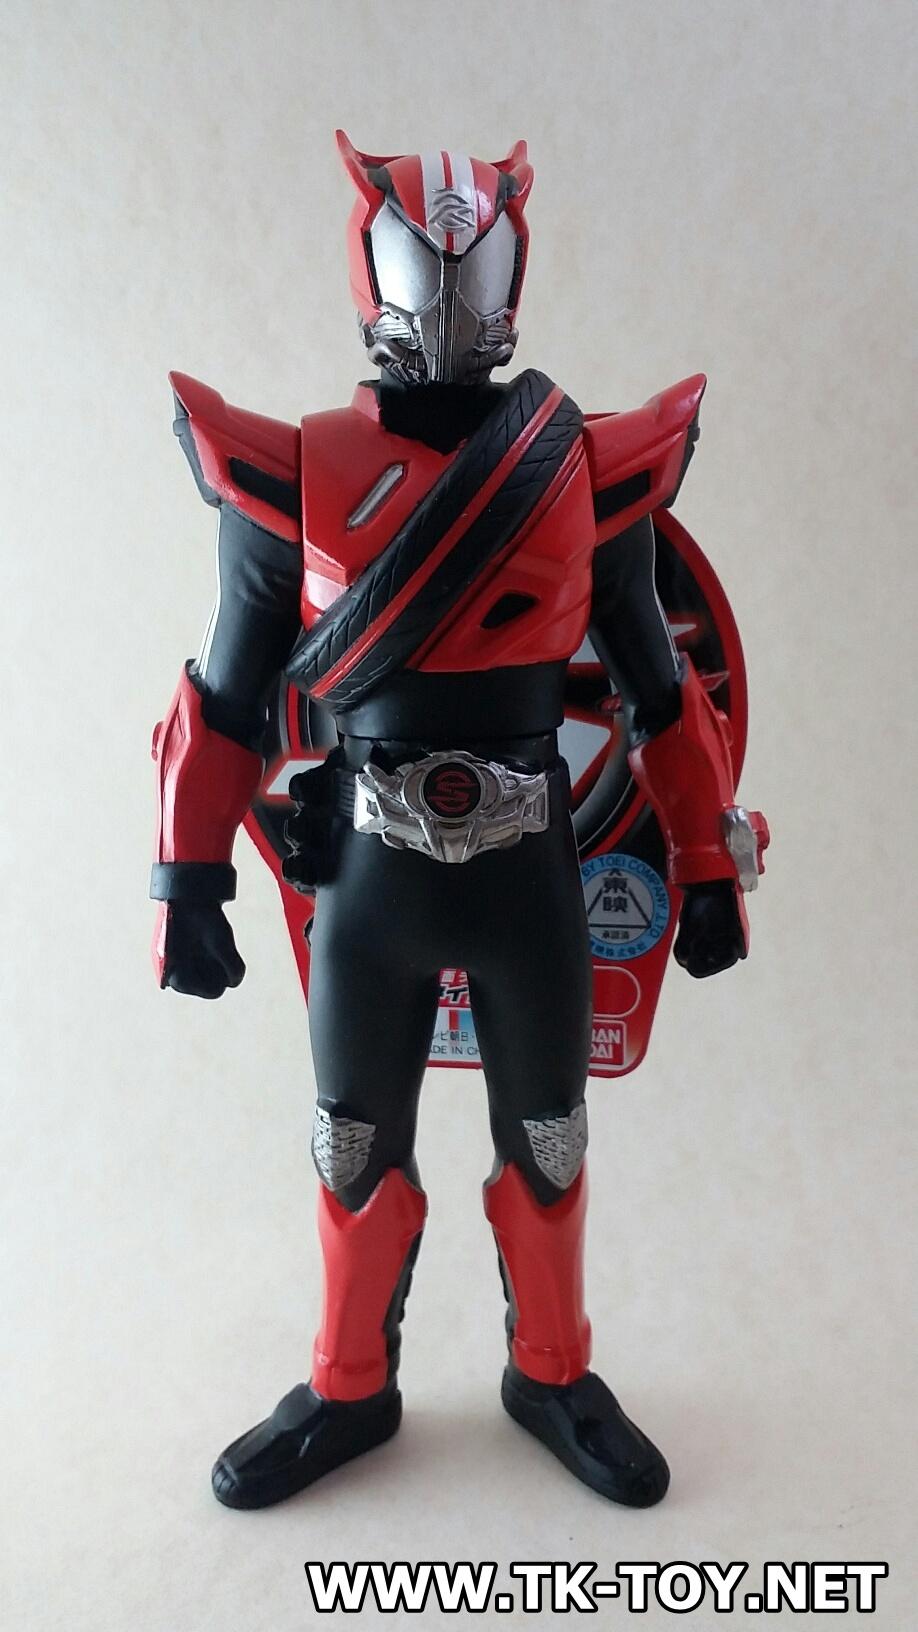 Kamen Rider Drive Rider Hero Series 01 Kamen Rider Drive Type Speed (ซอฟไวนิล)